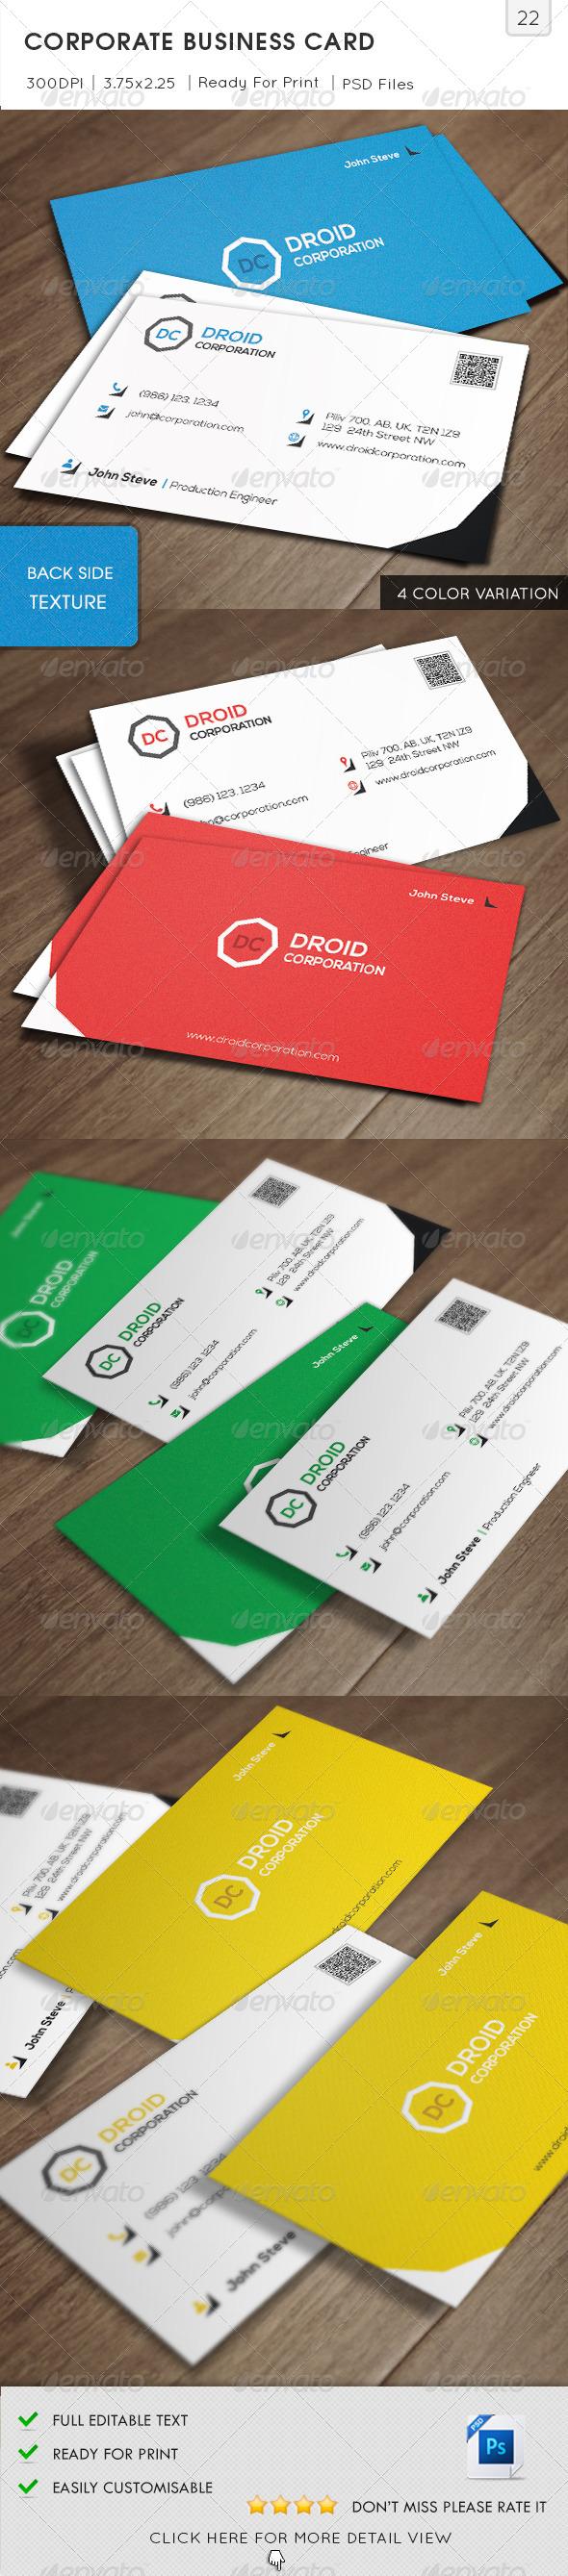 Corporate Business Card v22 - Corporate Business Cards